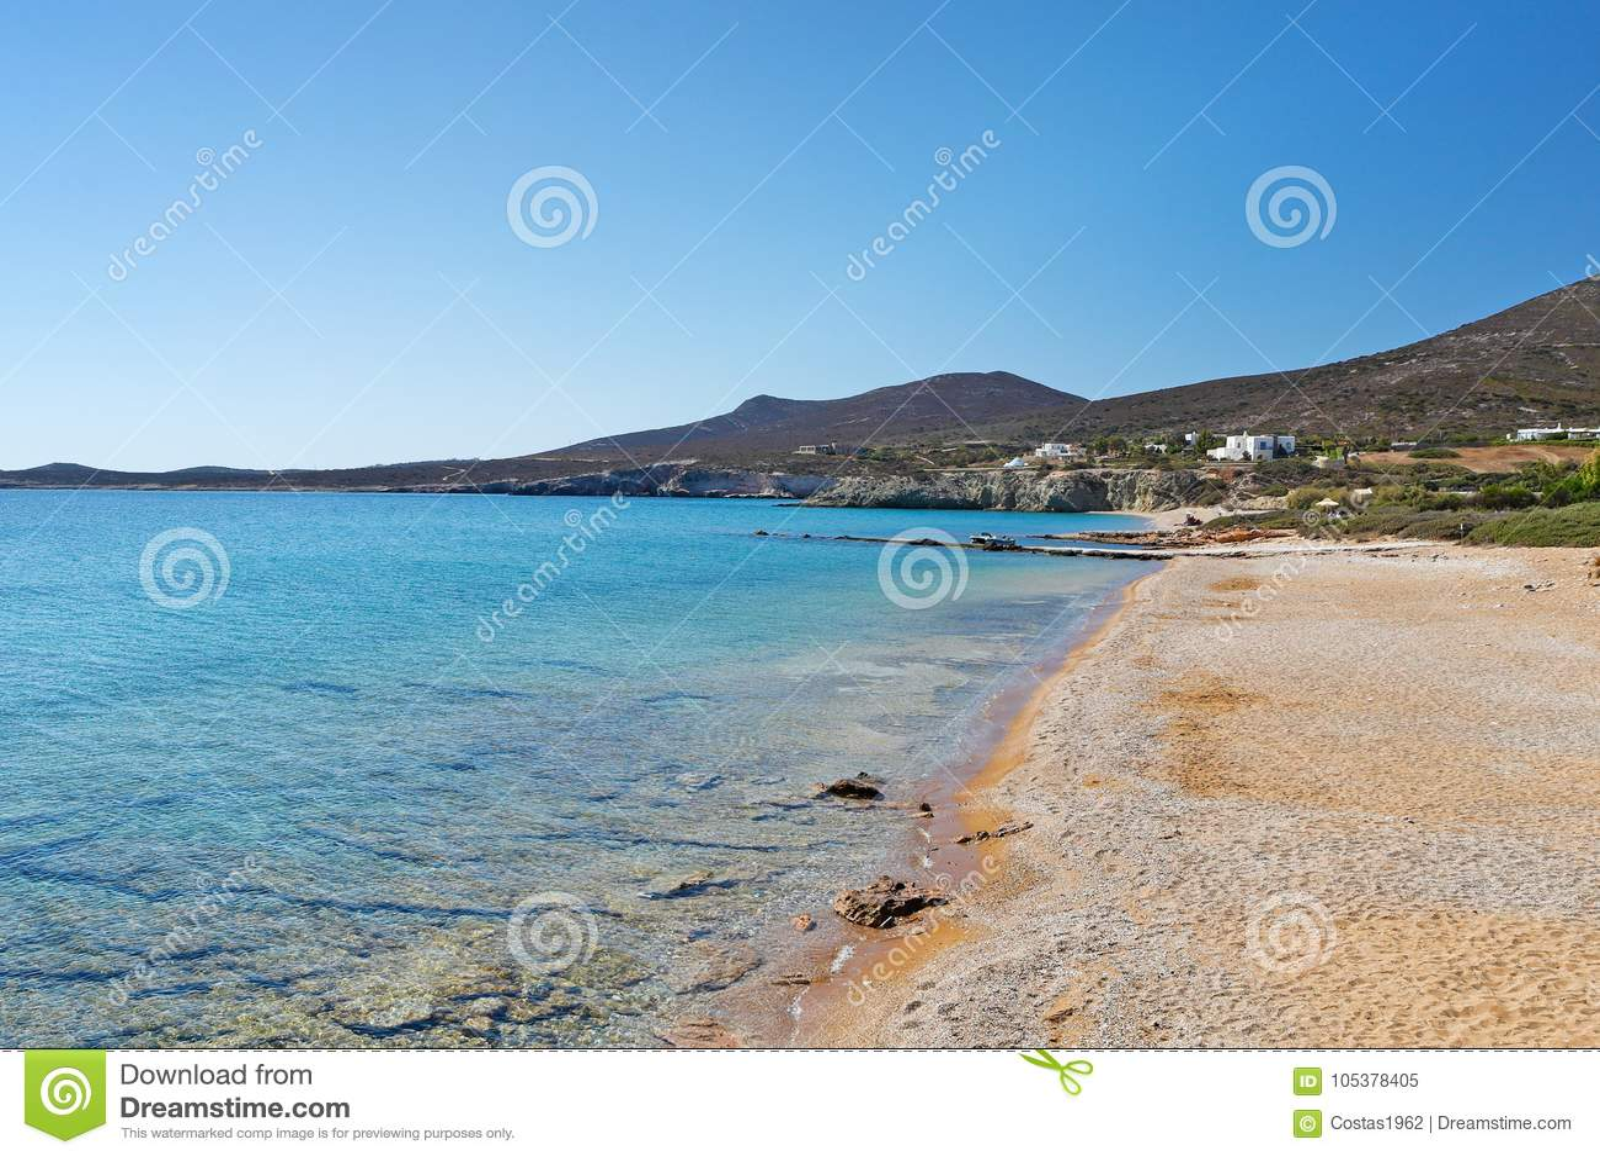 Soros beach of Antiparos, Greece